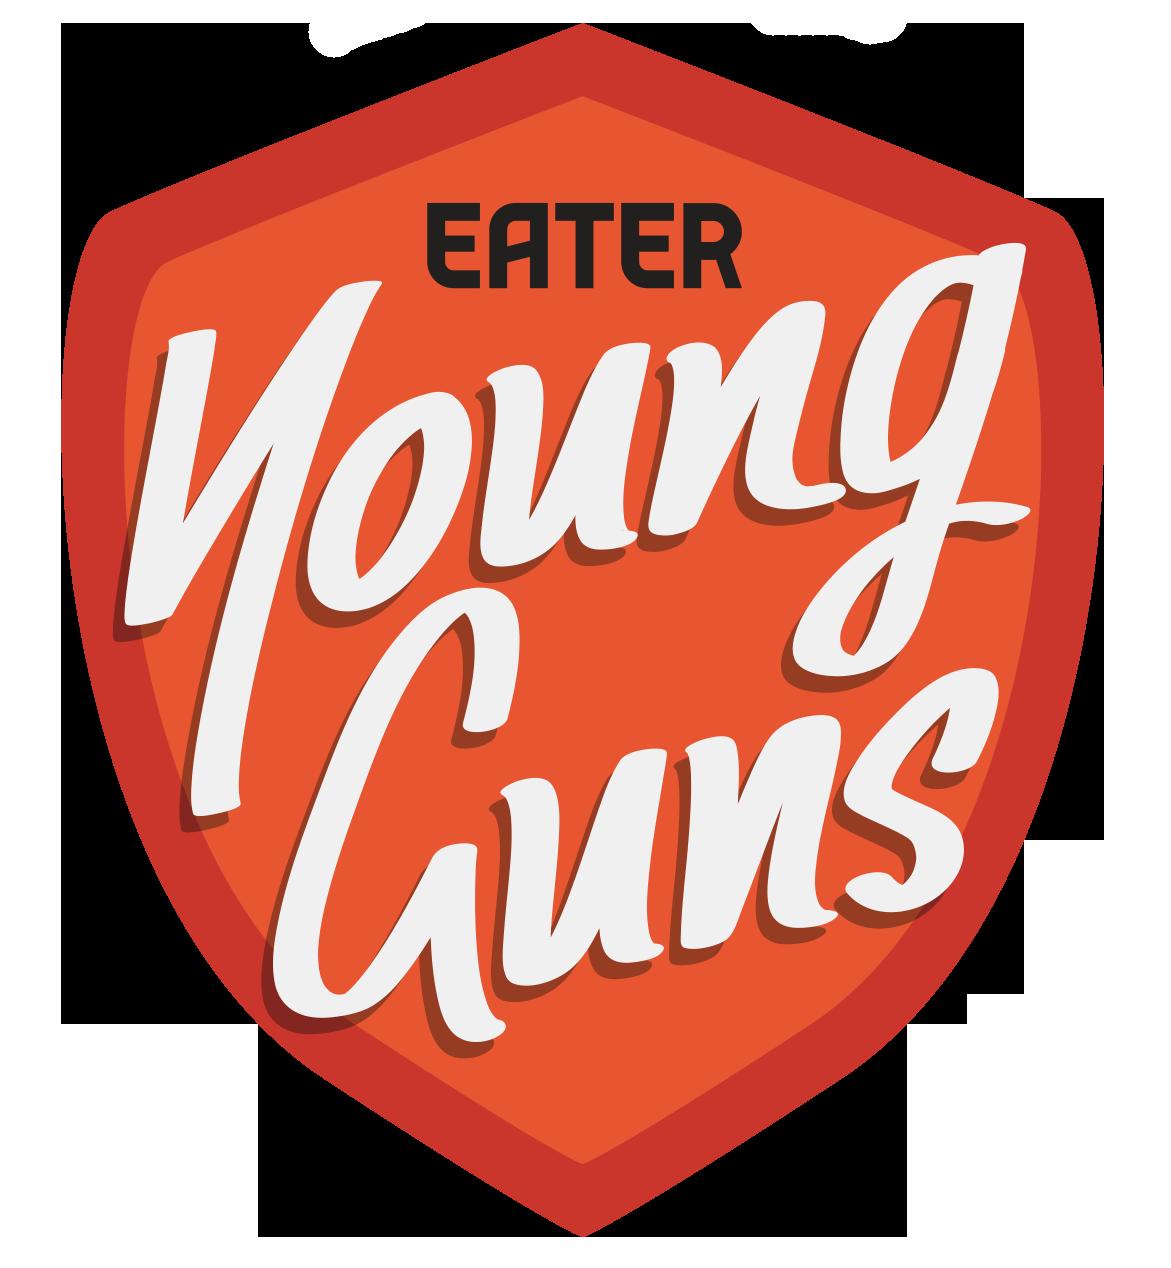 eater young guns logo